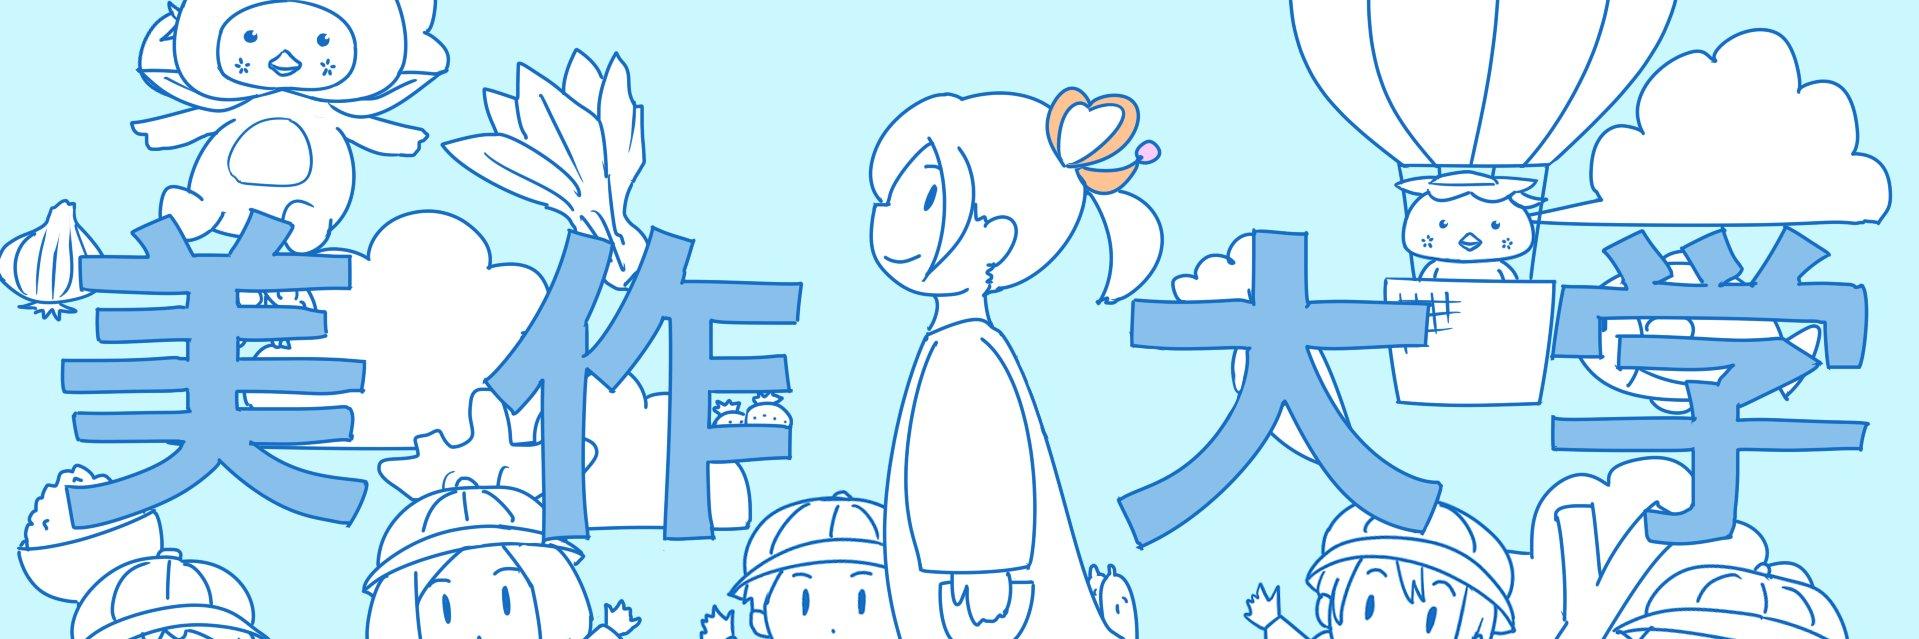 Mimasaka University's official Twitter account